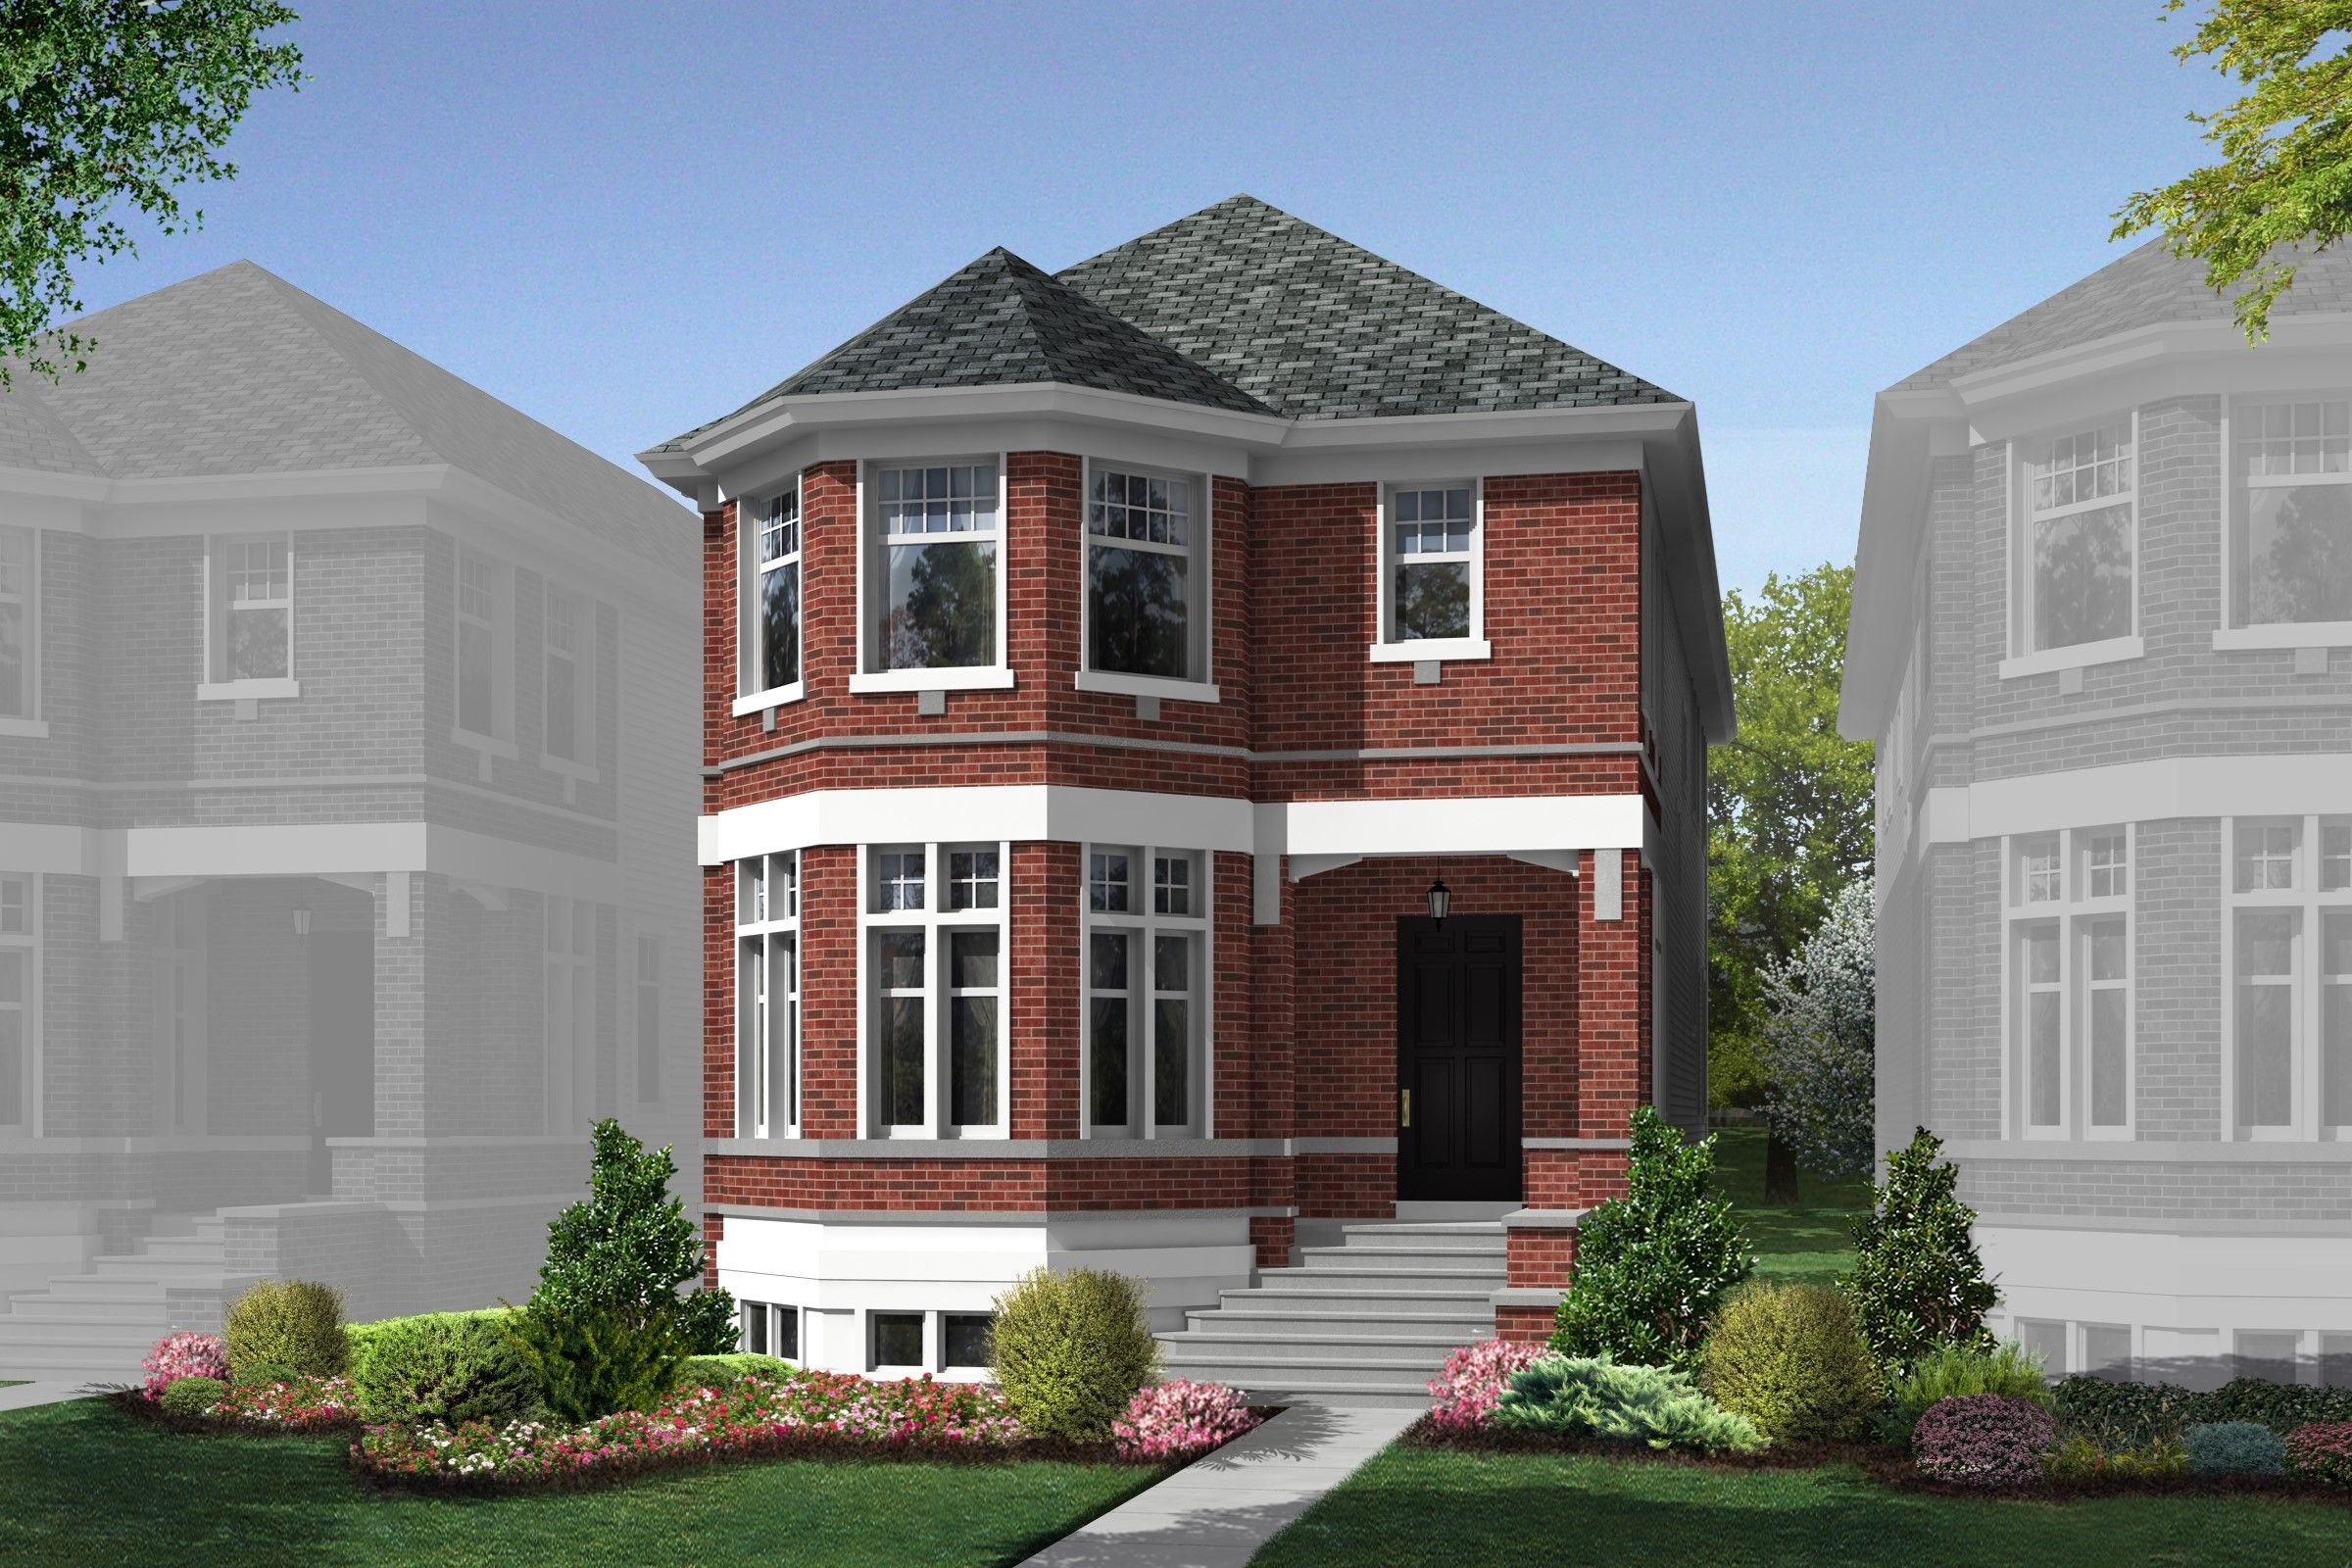 6086 N. Sauganash Avenue, Homesite 28, Near North Side Chicago, IL Homes & Land - Real Estate